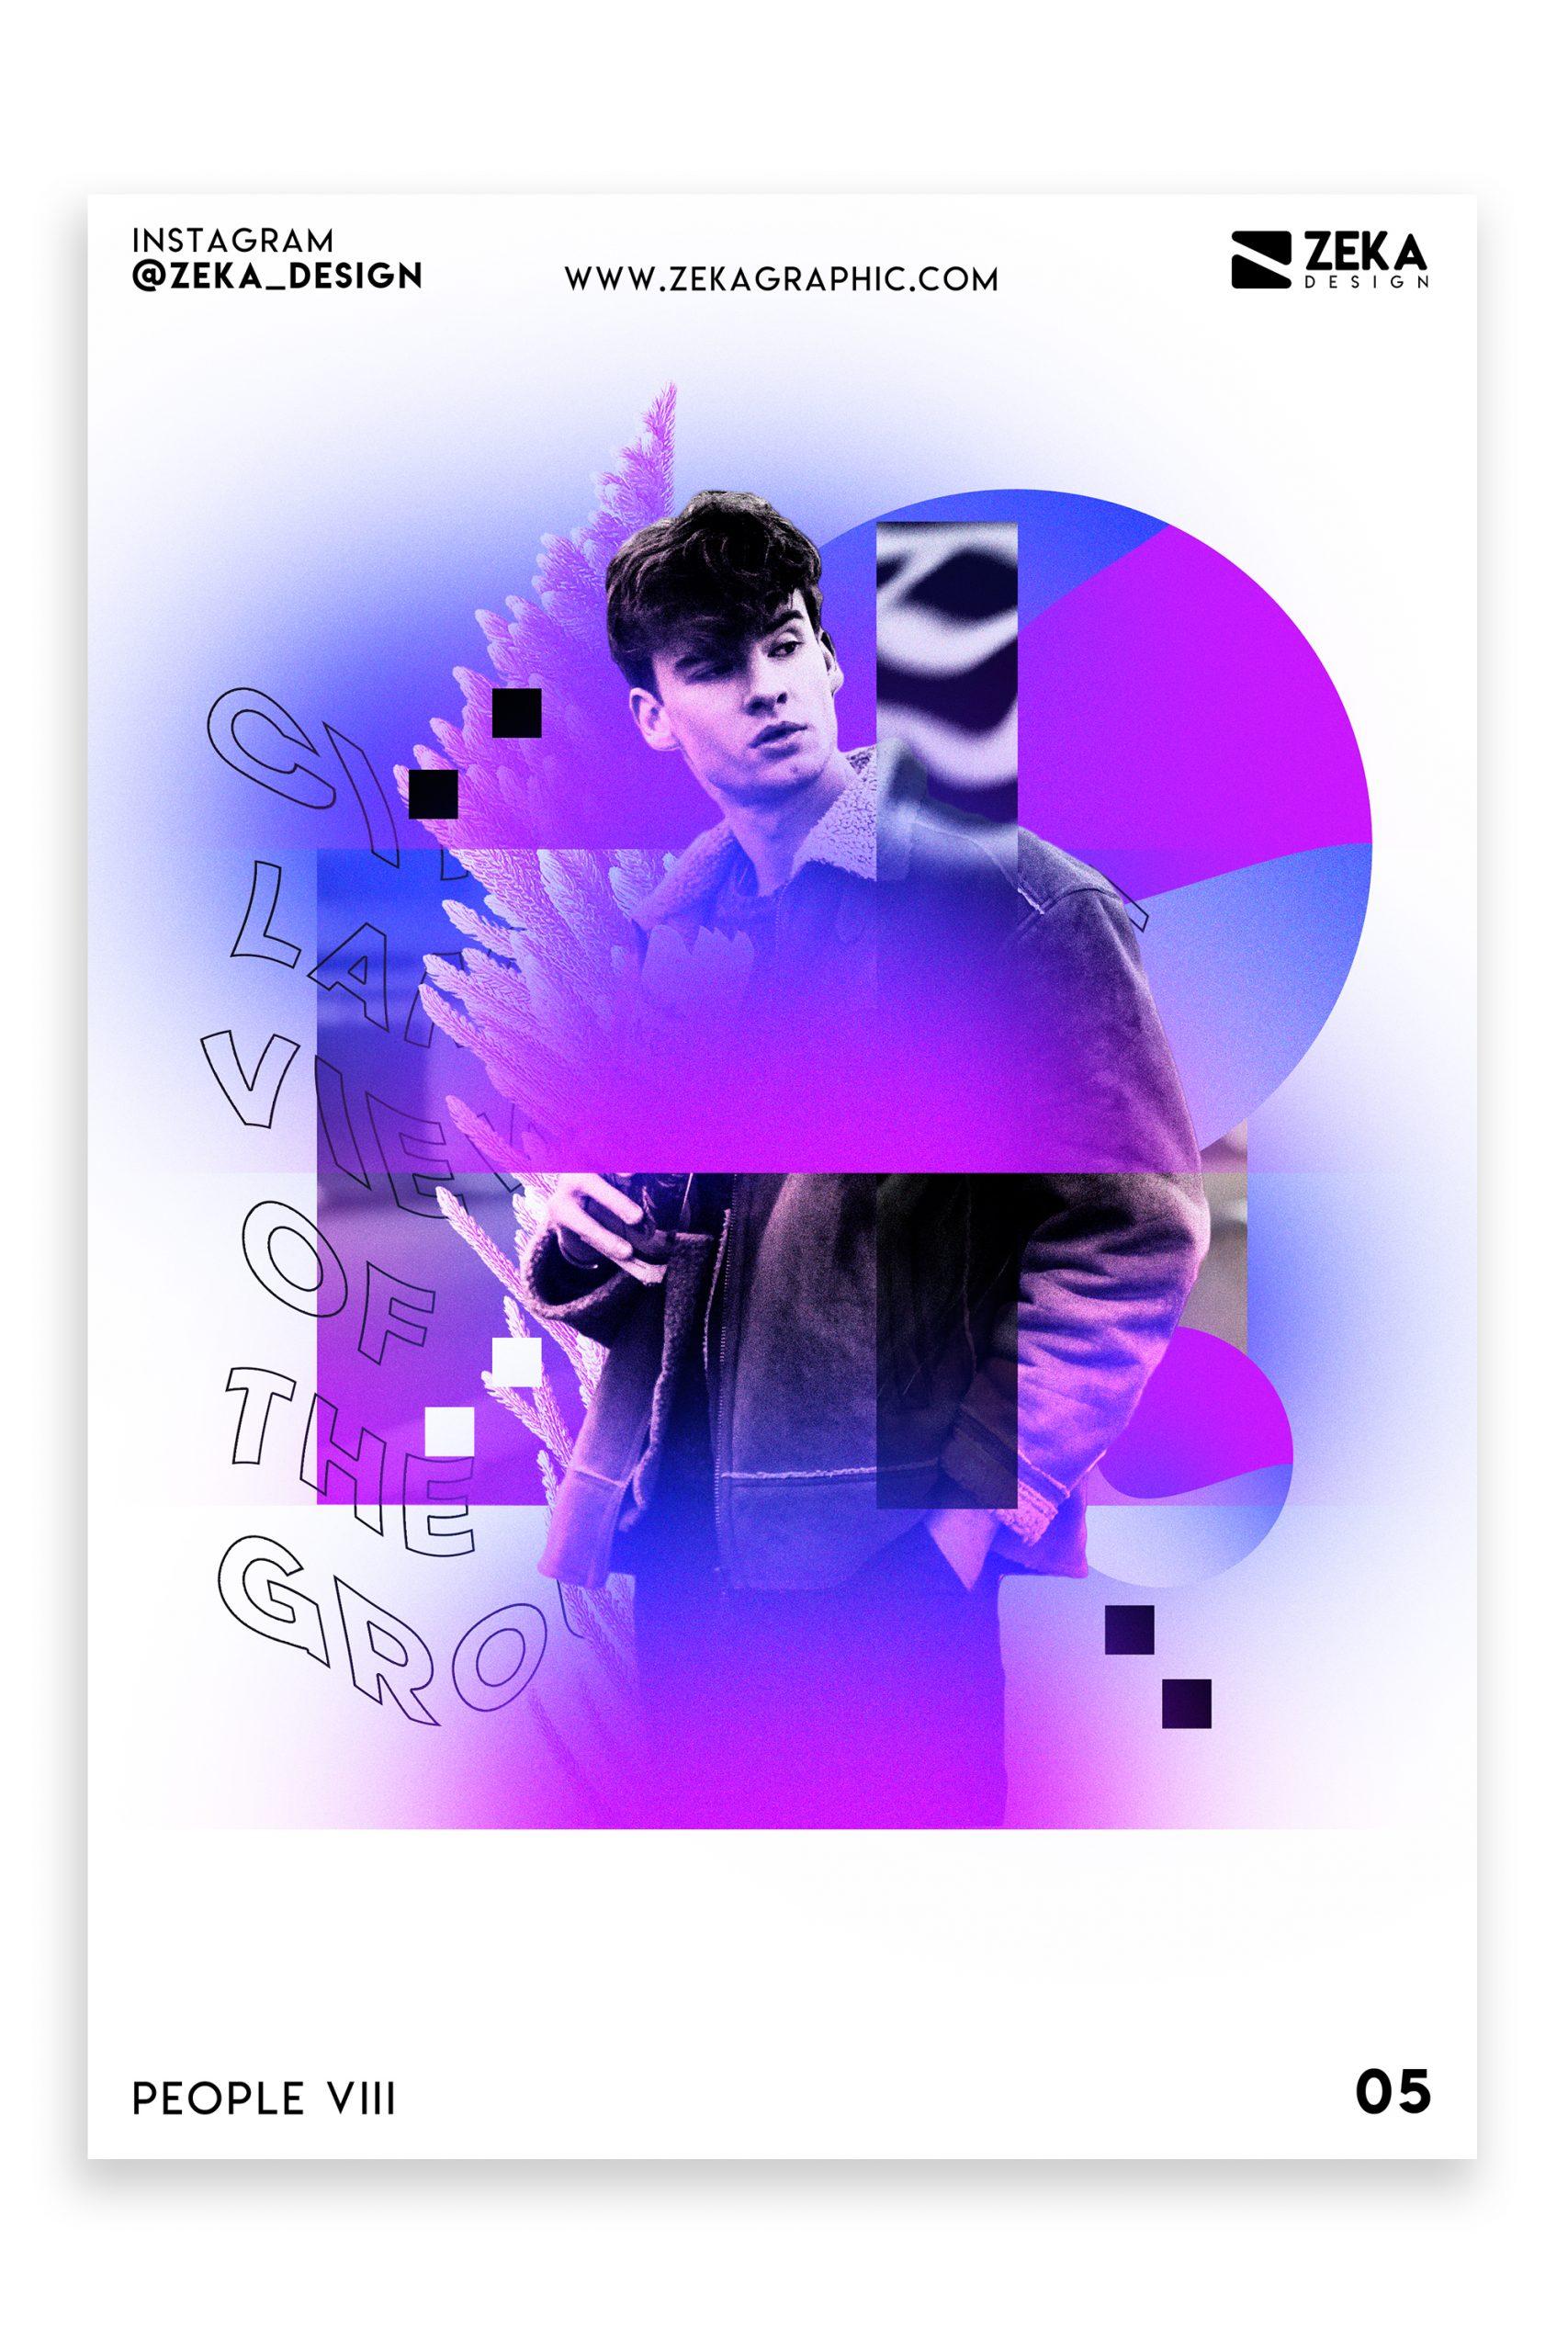 People VIII Poster Design Inspiration Zeka Design Graphic Design Portfolio 5